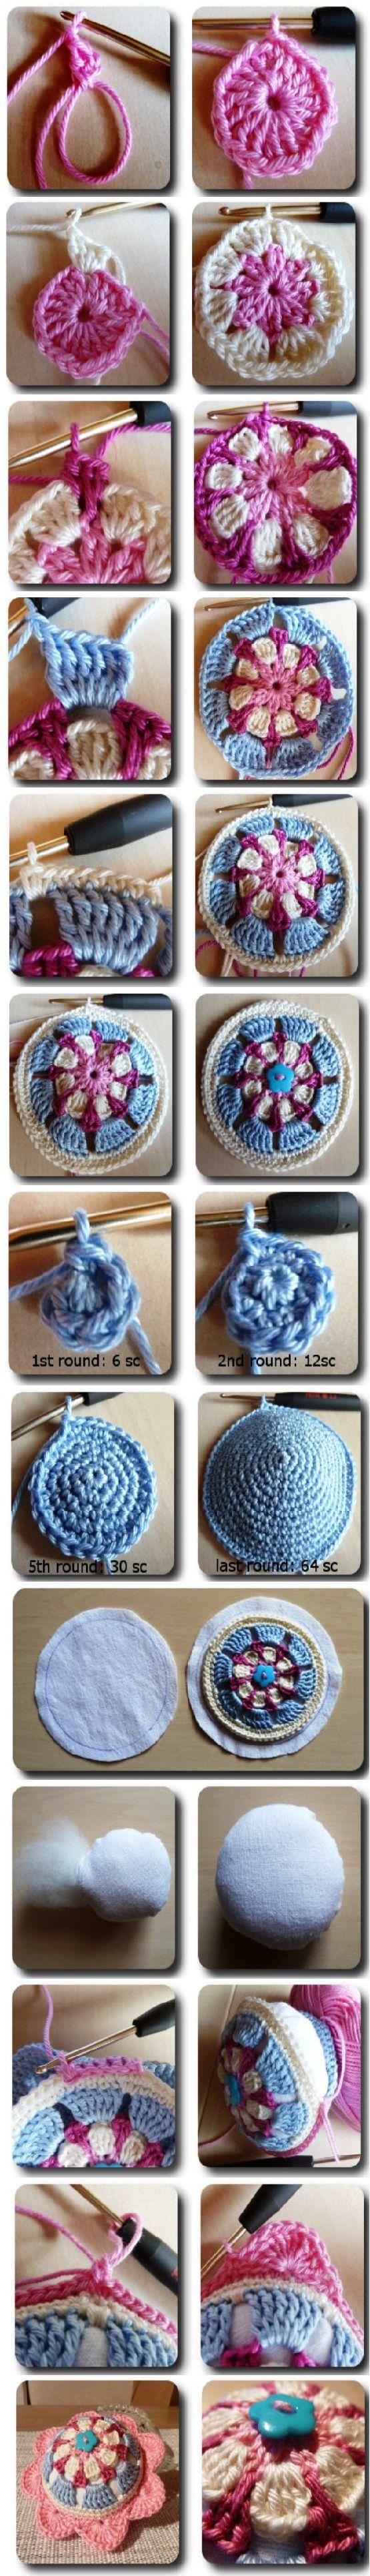 crochet pincushion tutorial - colors and fun!